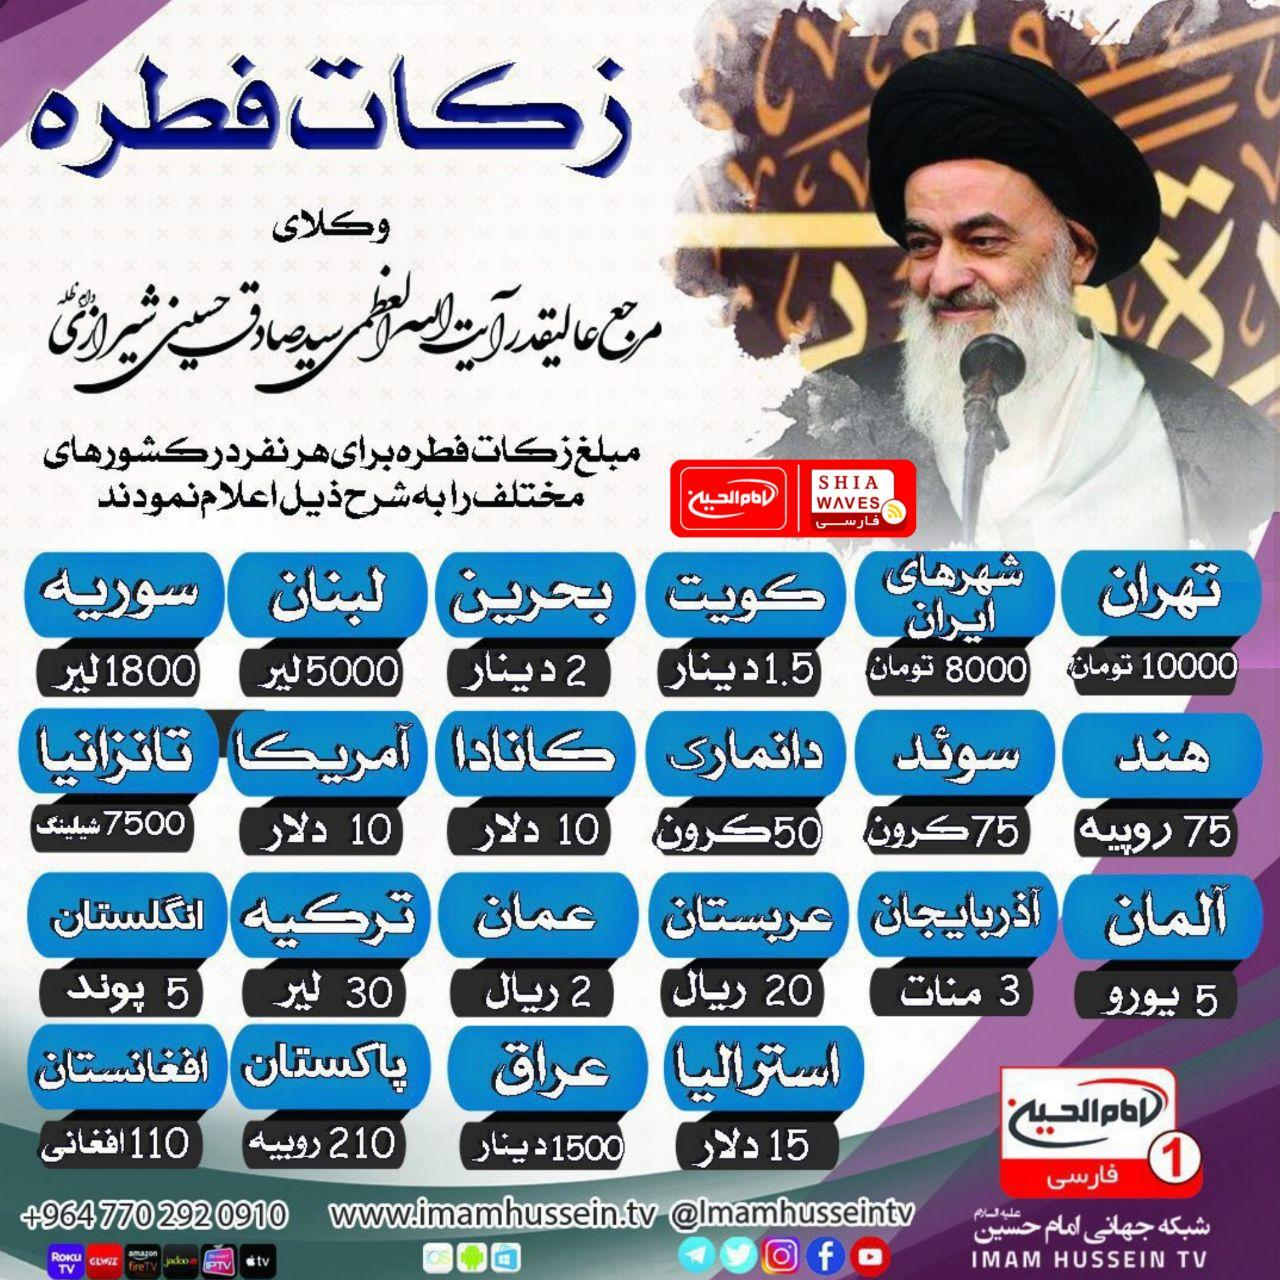 Photo of اعلام میزان زکات فطره، از سوی دفتر حضرت آیت الله العظمی شیرازی